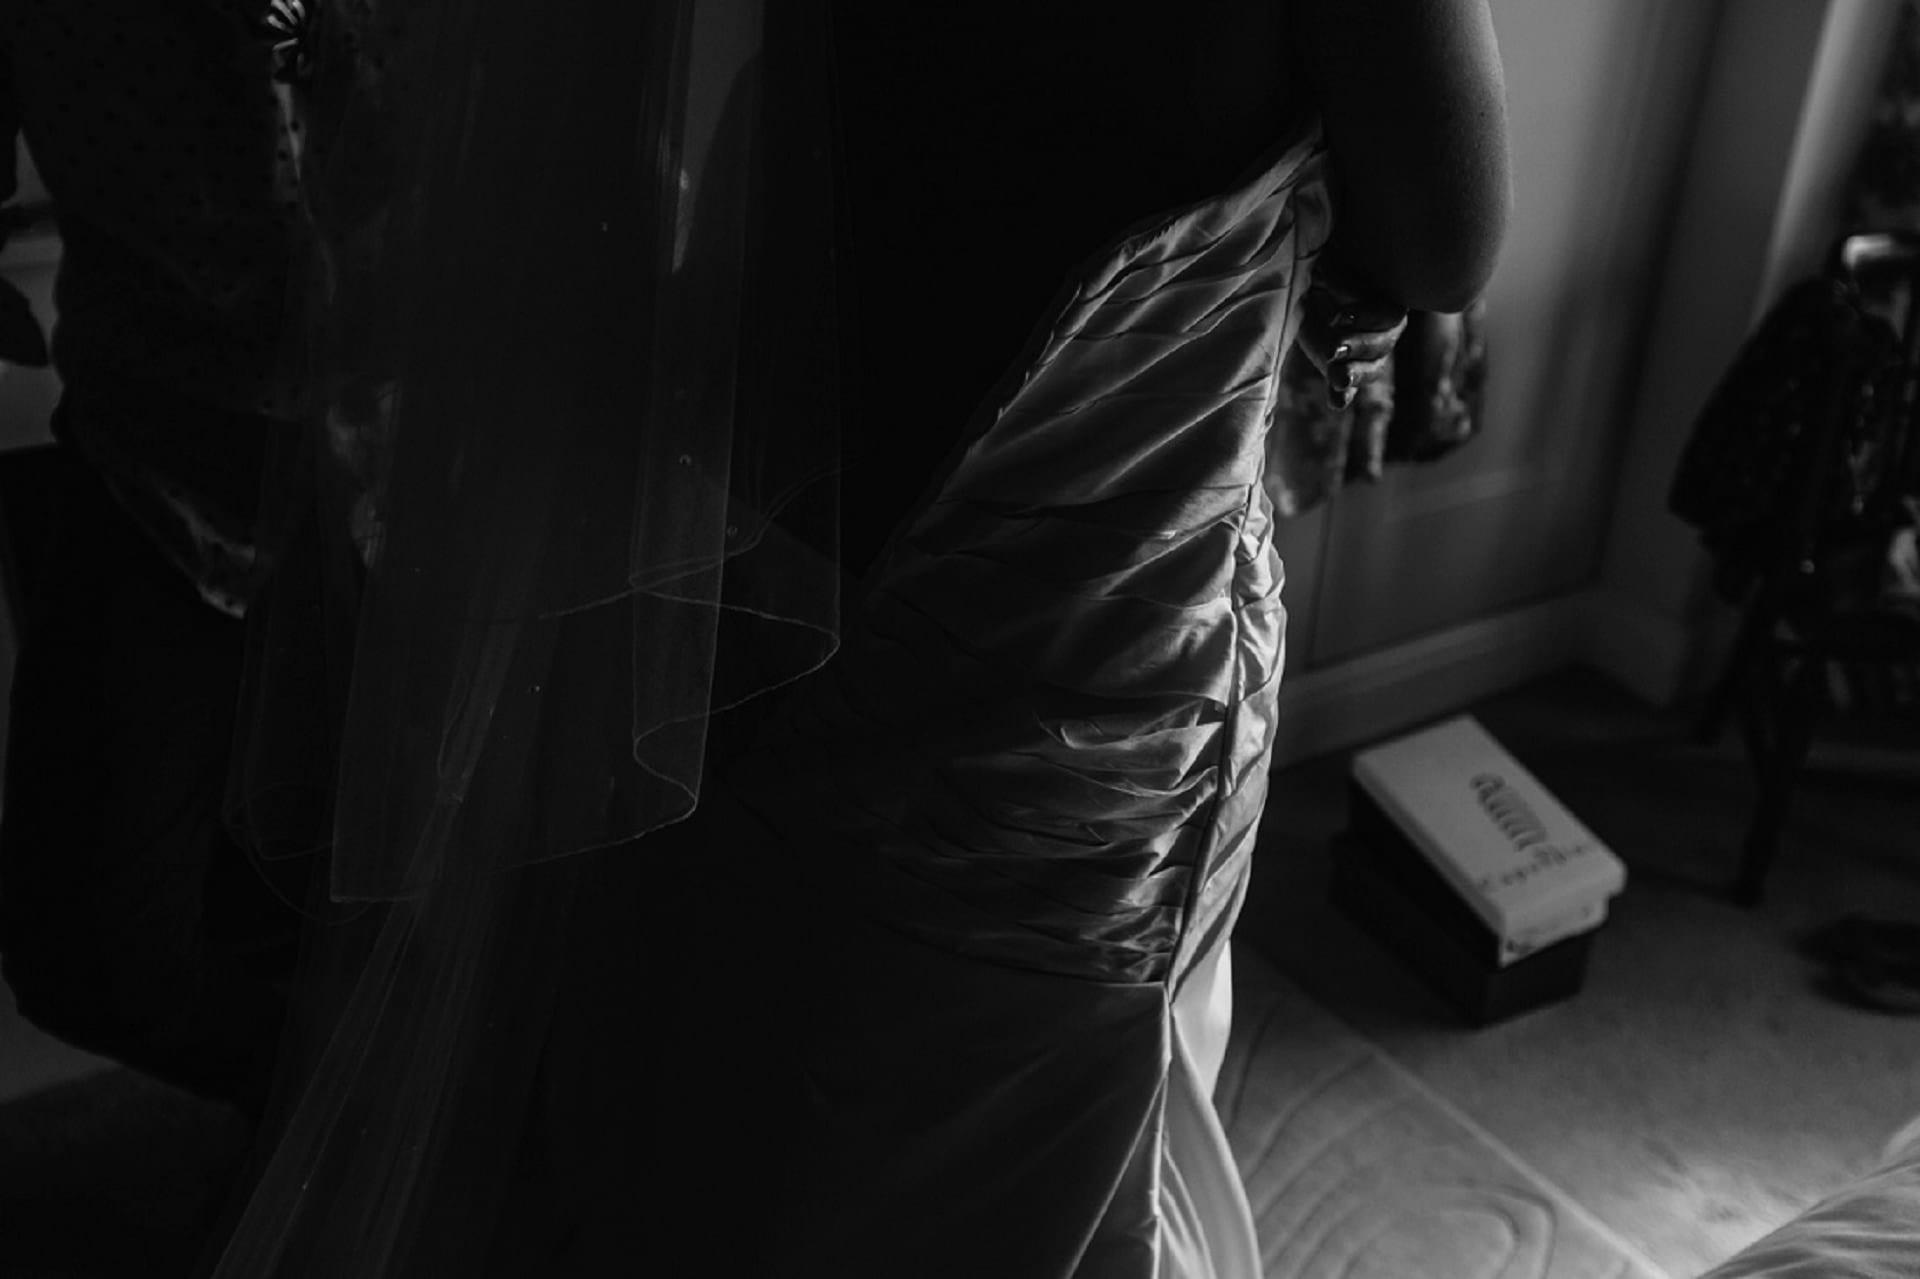 Light highlighted on a wedding dress